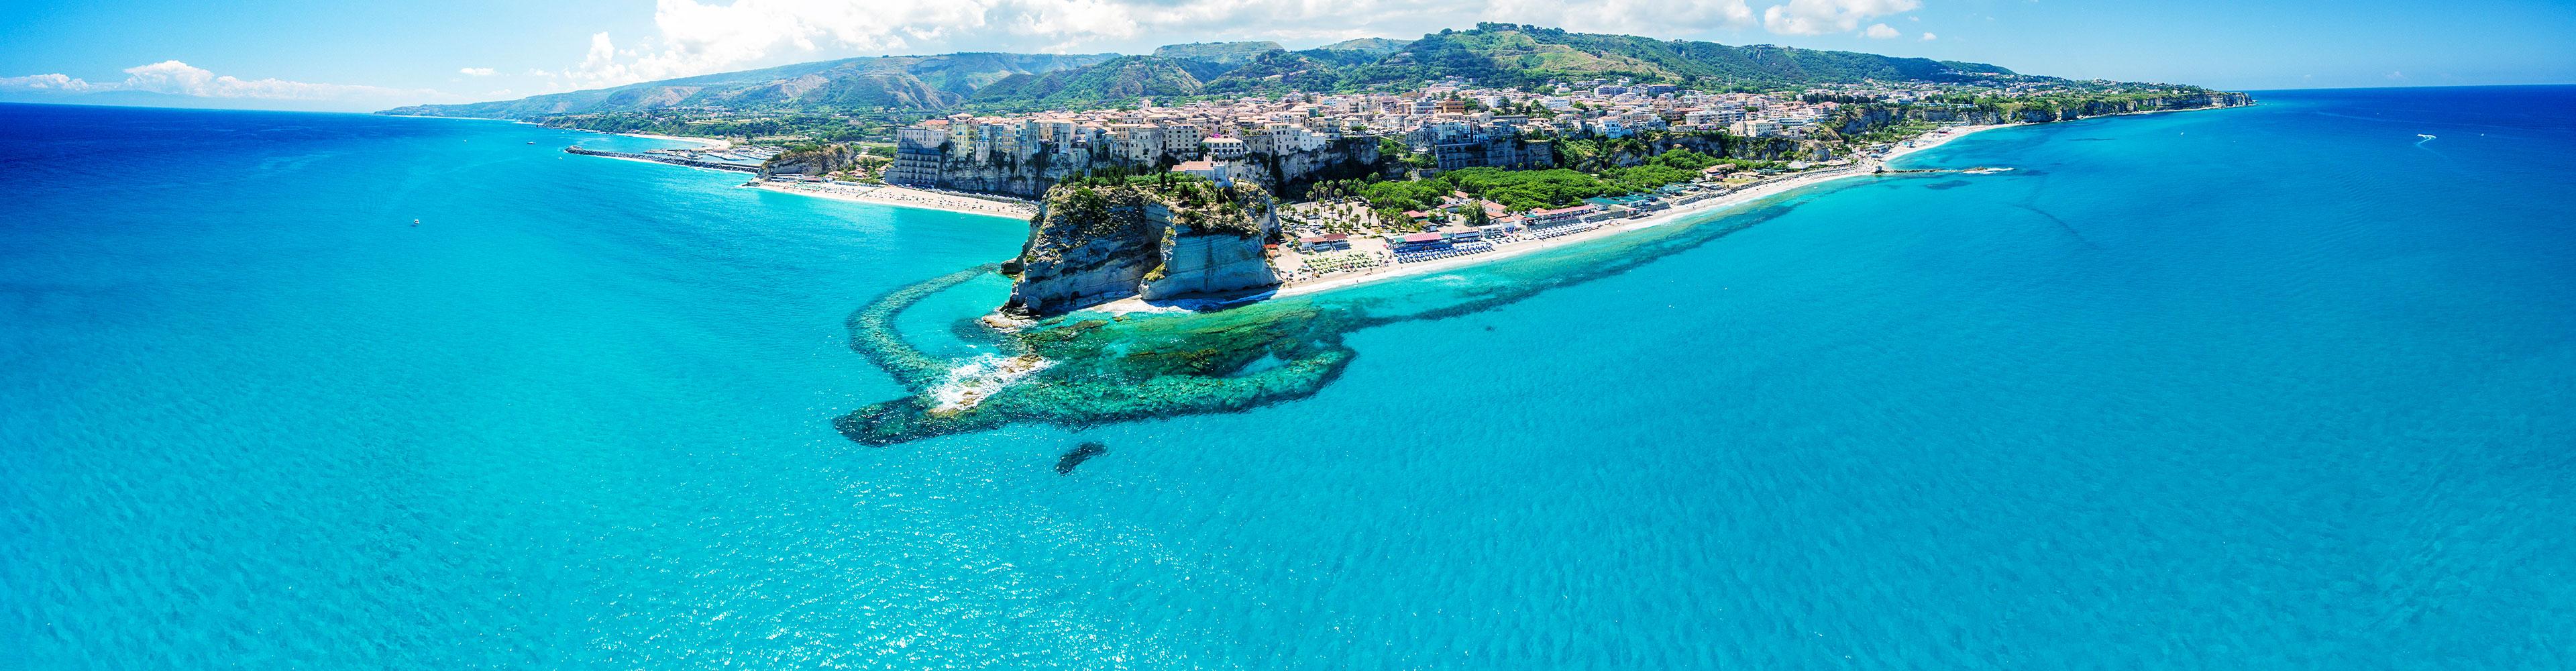 Highlights of Calabria & Sicily